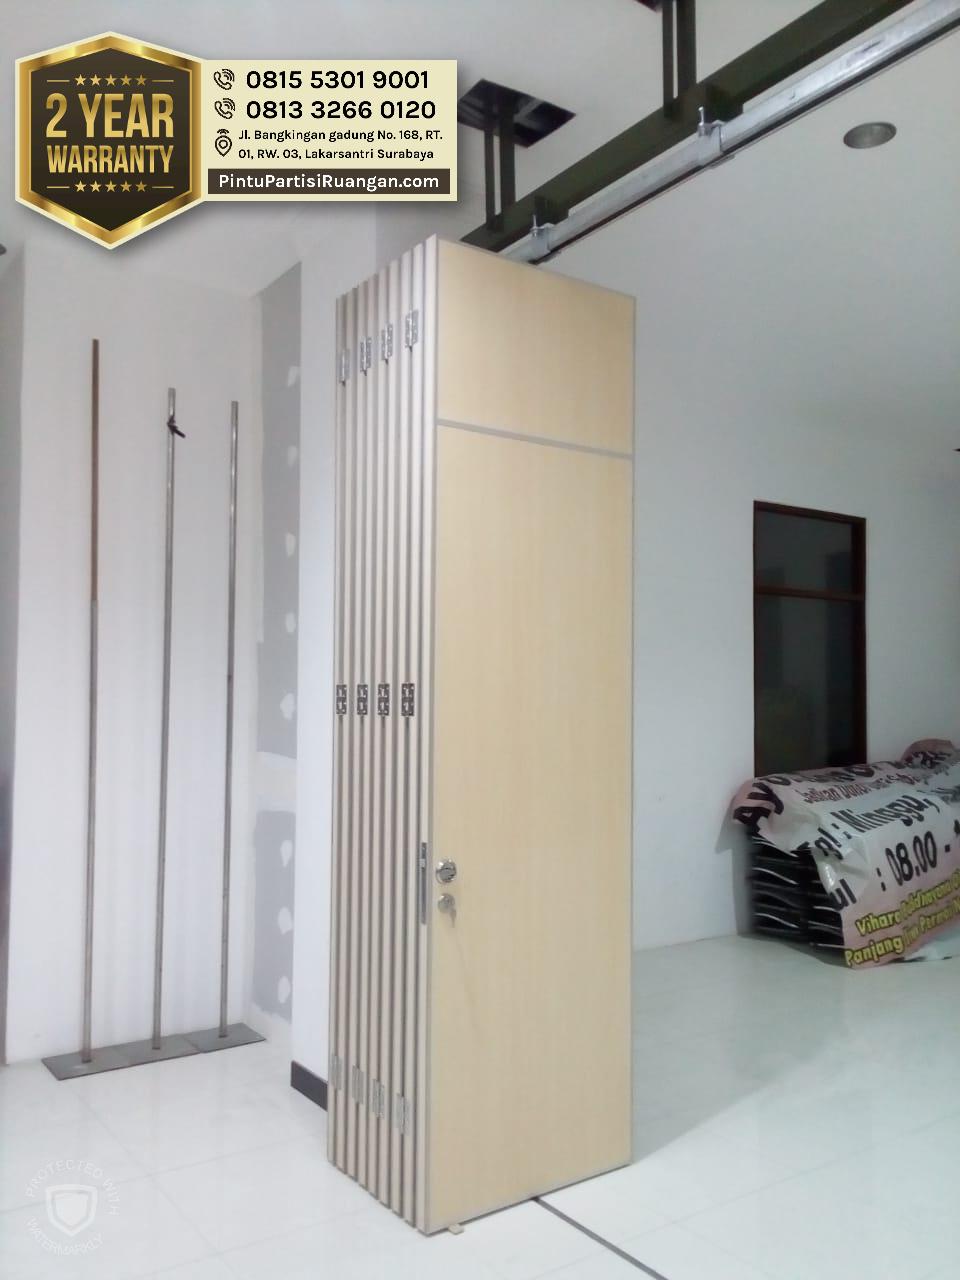 Pireki Partisi Ruangan Pintu Geser Minimalis Jakarta Pusat